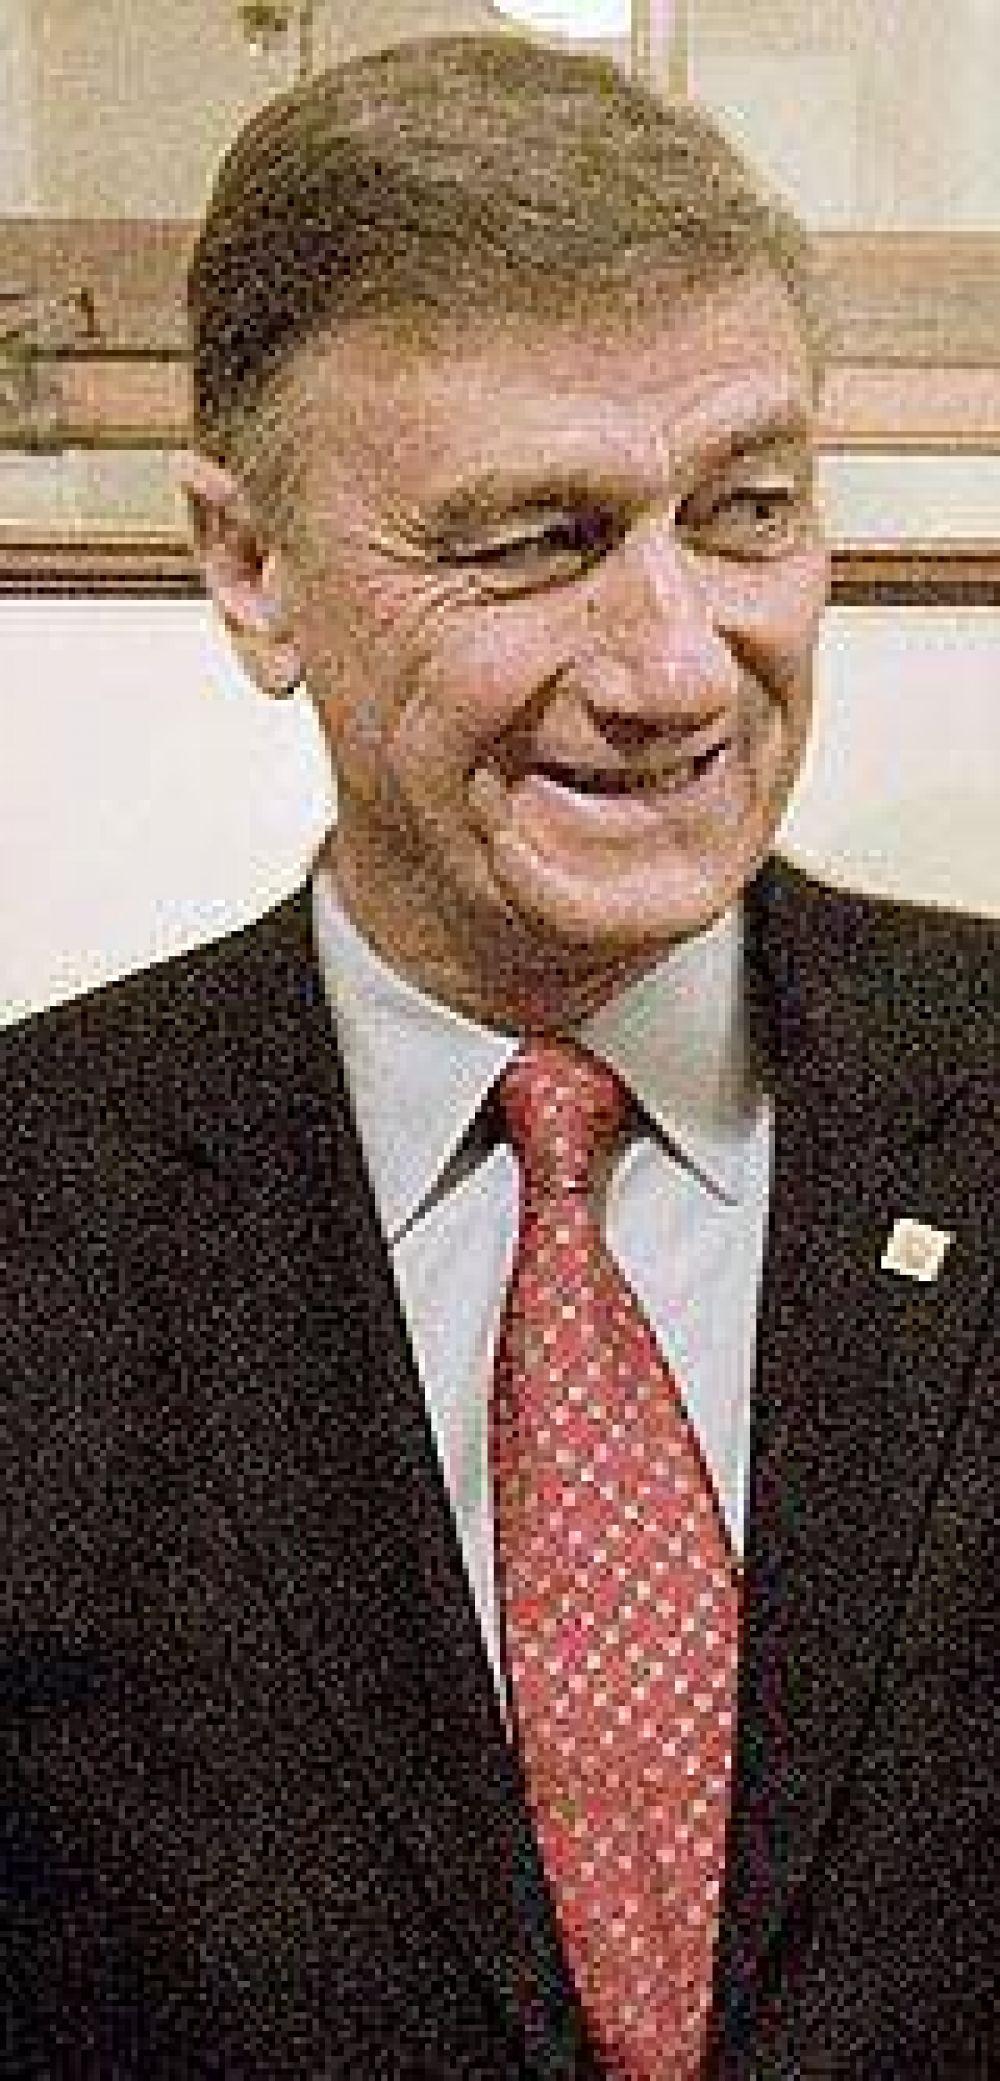 Guiño de Binner a una eventual candidatura presidencial de Duhalde